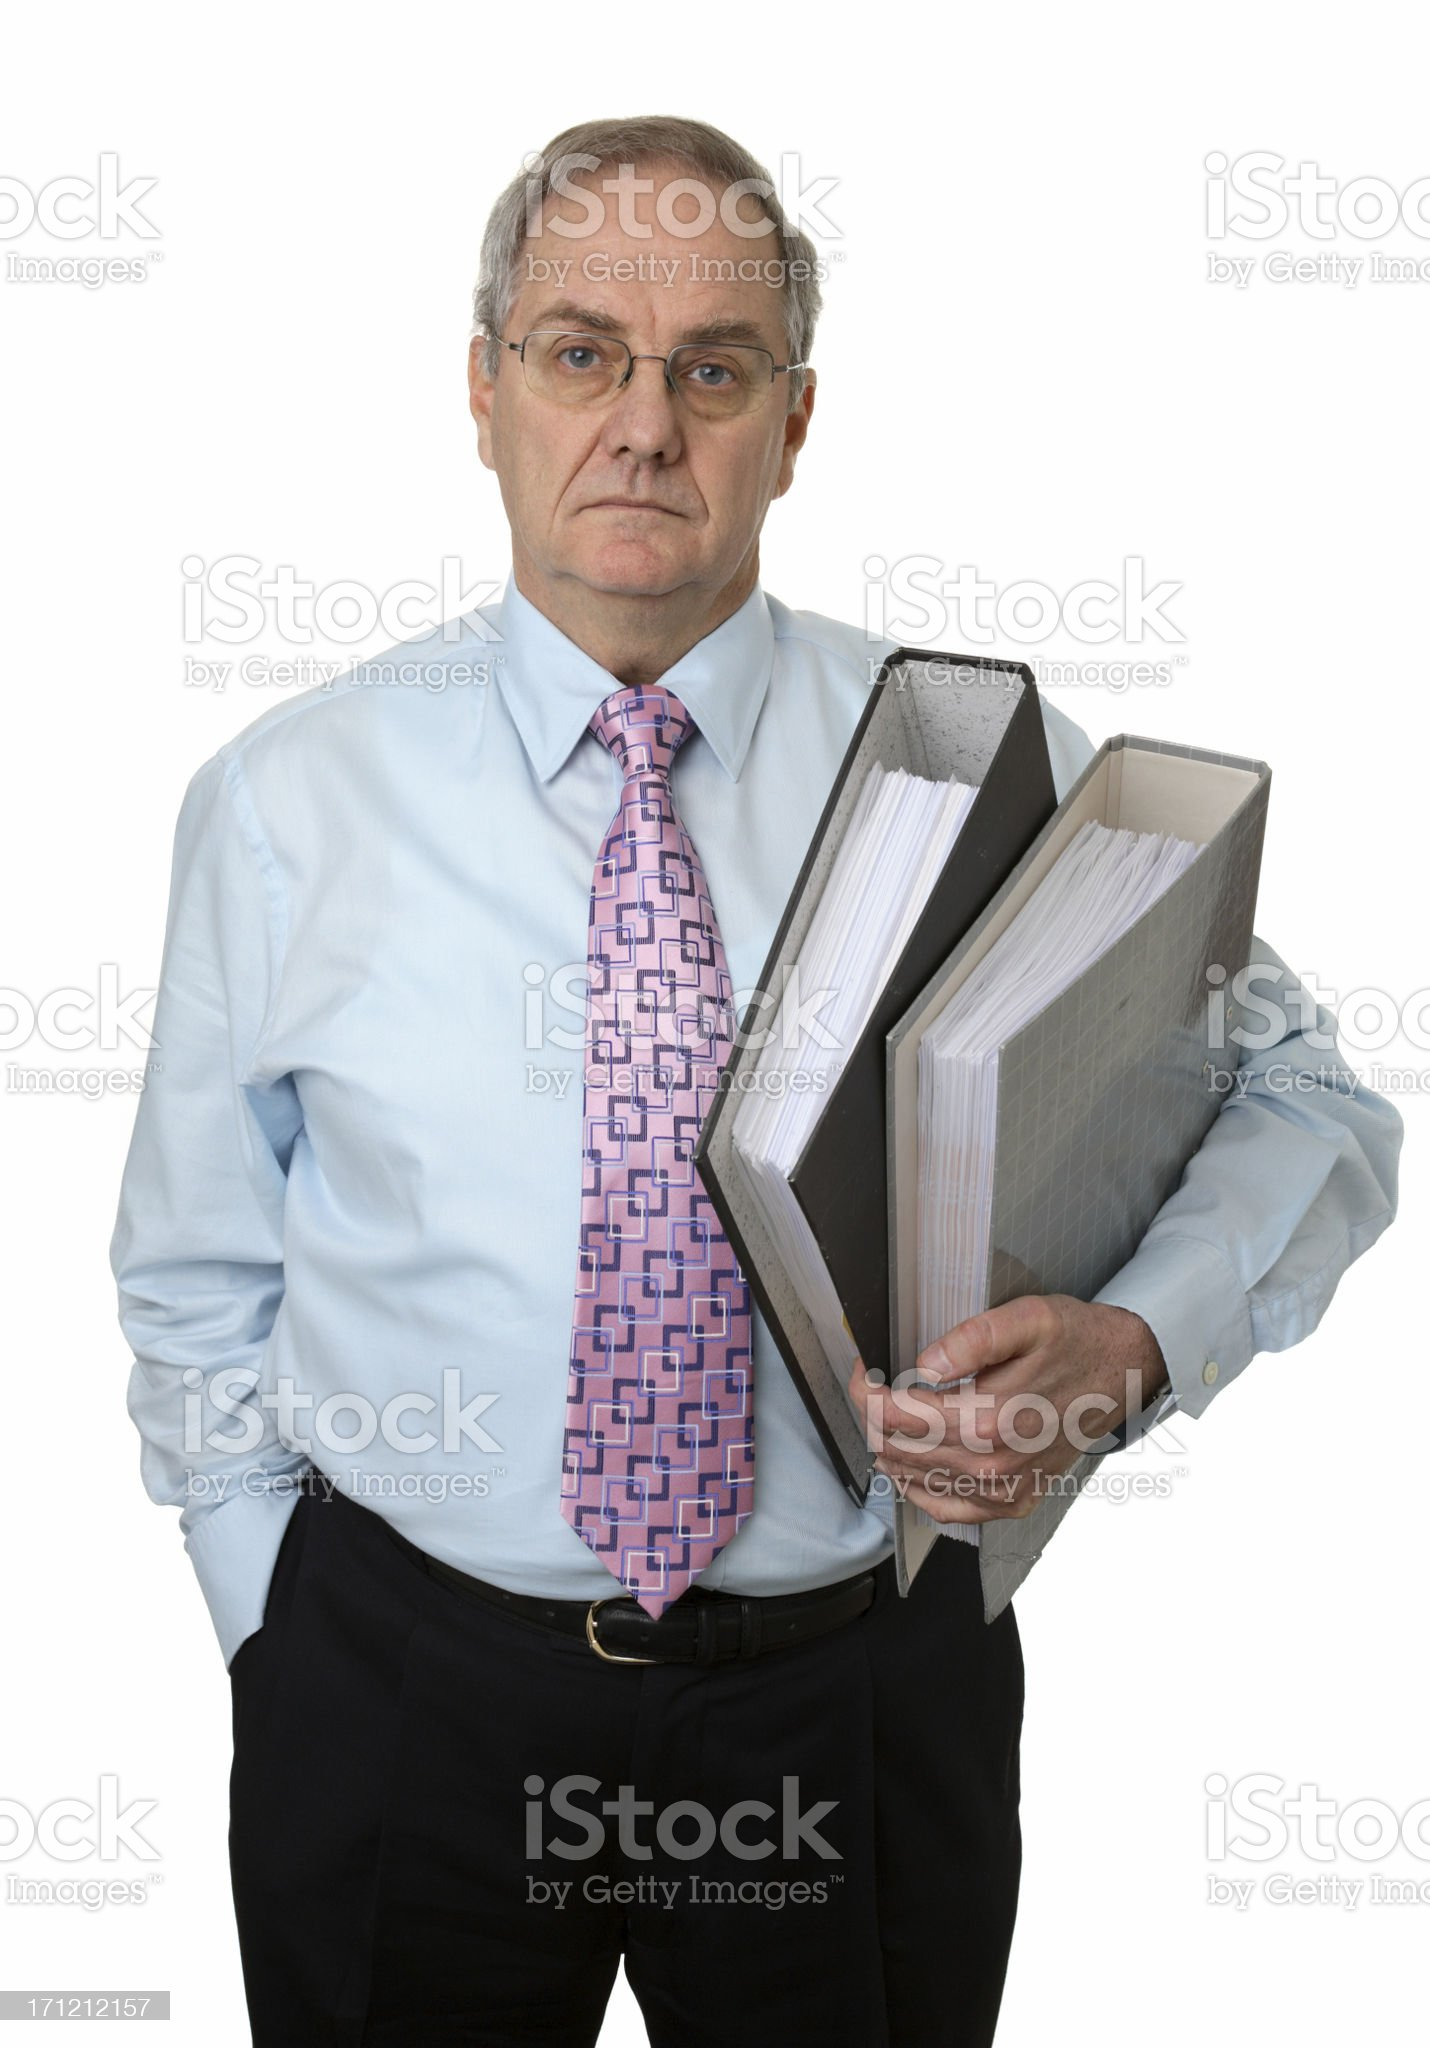 Holding Folders royalty-free stock photo